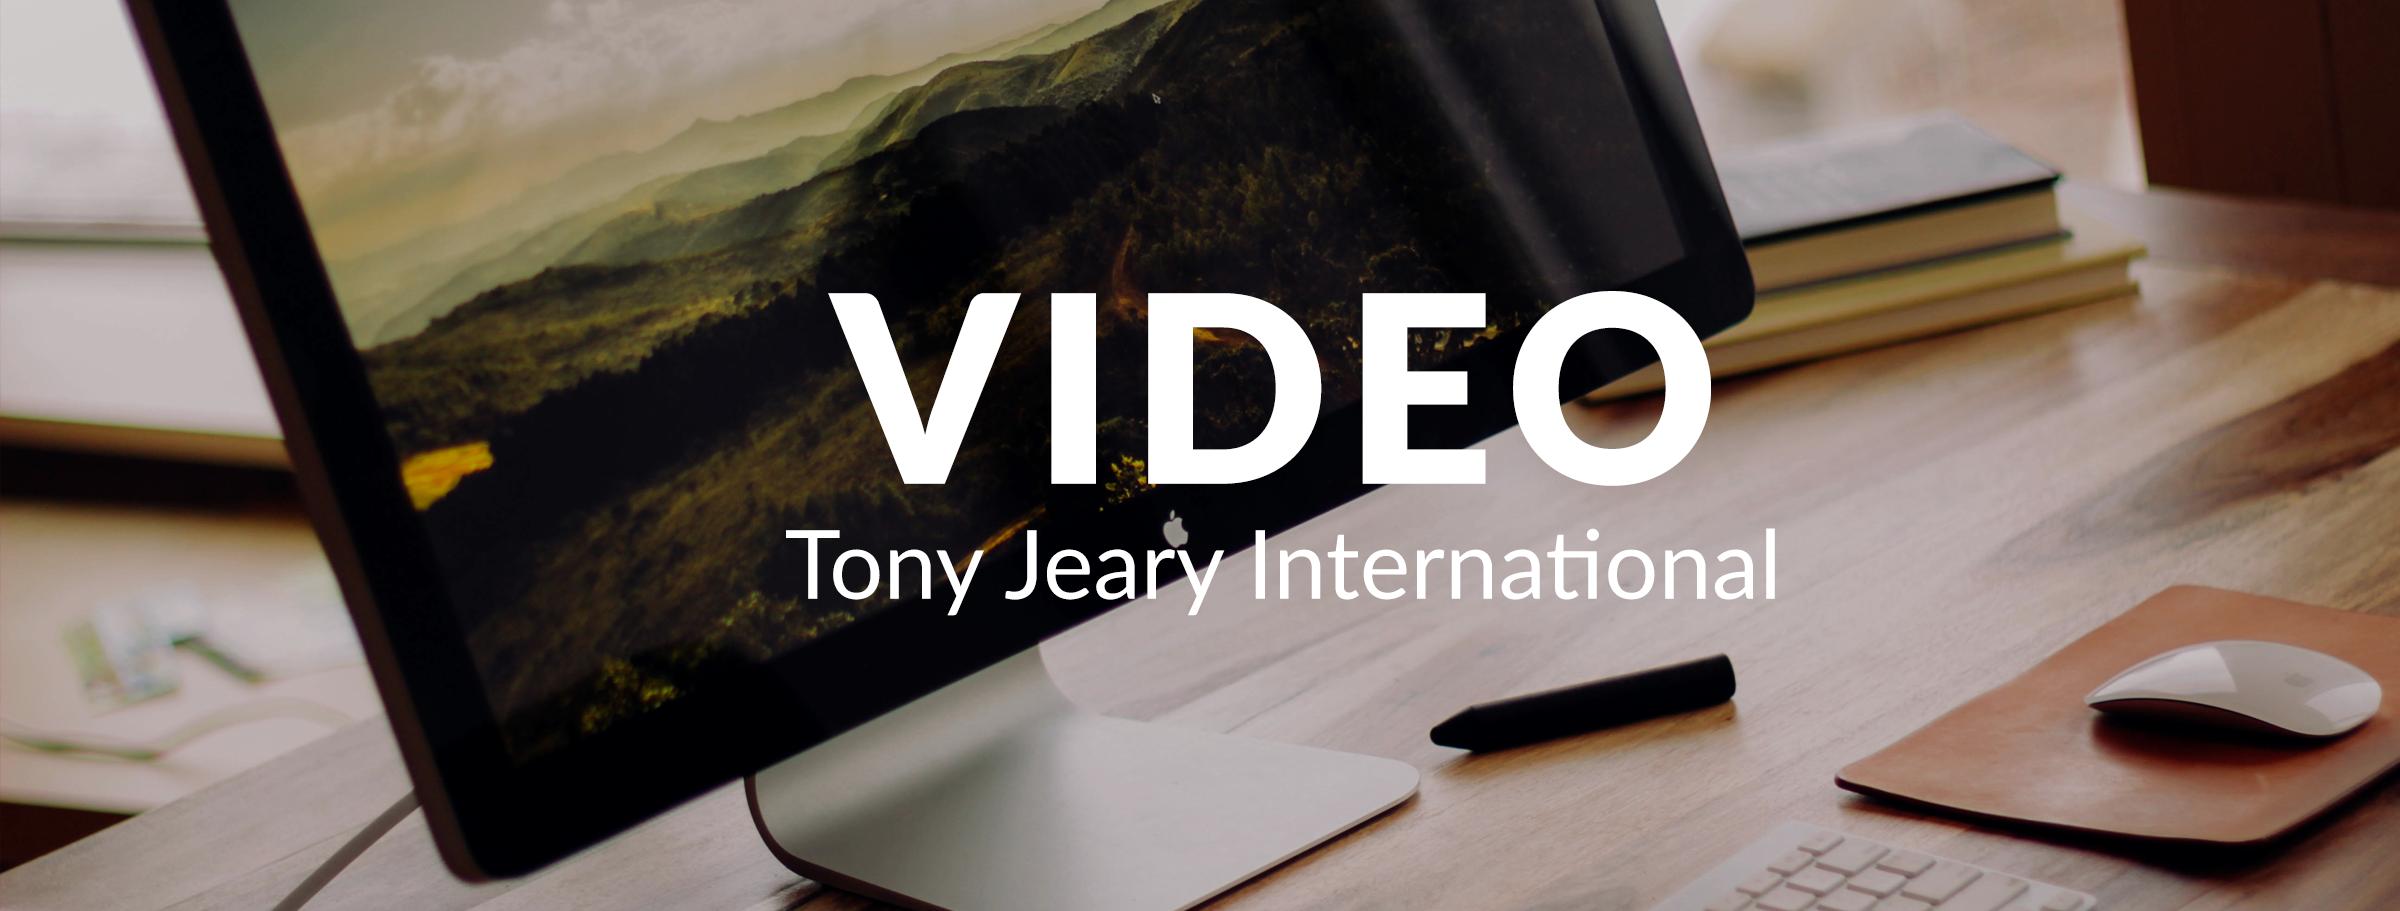 Tony_Video_Page